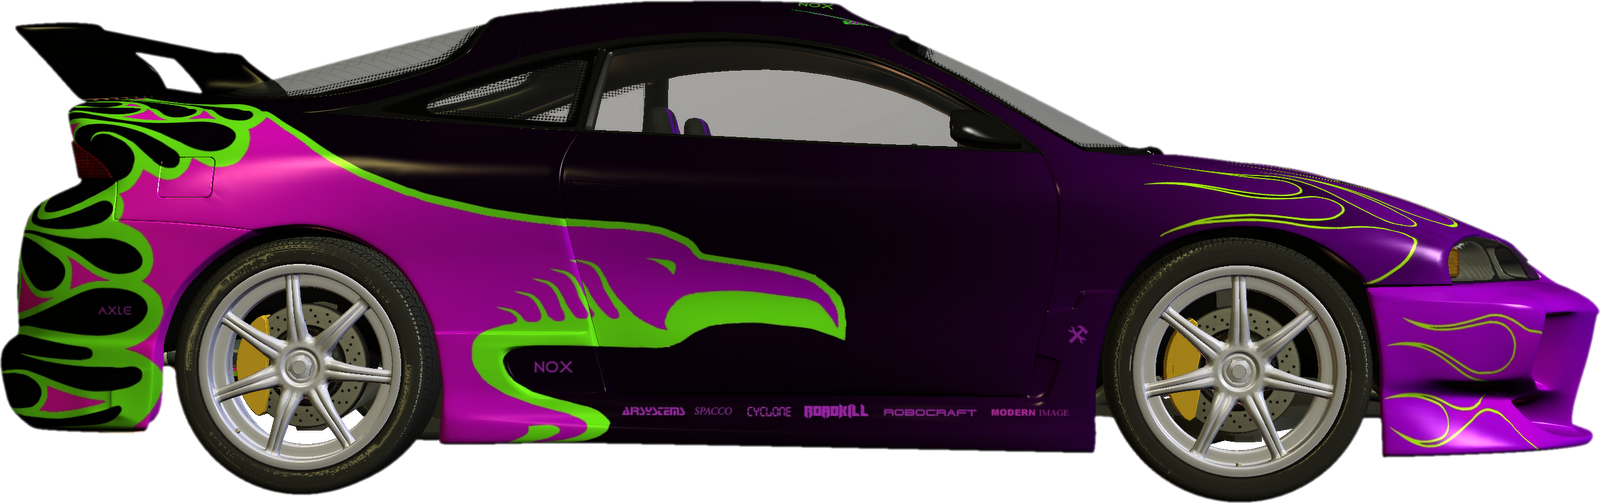 Race Car Images Cliparts-Race car images cliparts-15